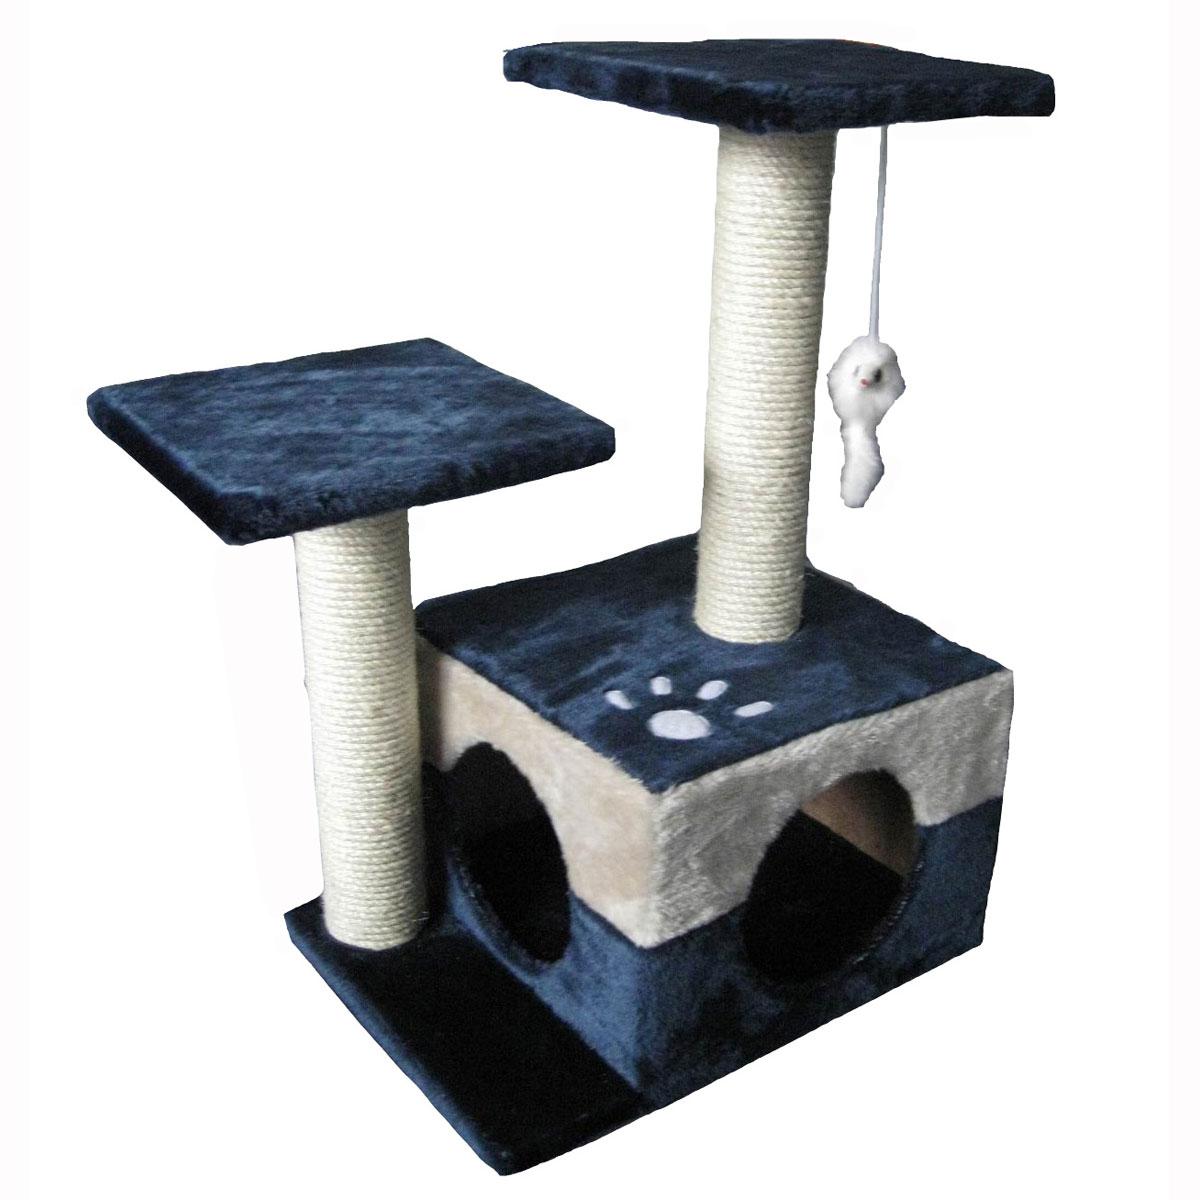 arbre a chat 20 euros. Black Bedroom Furniture Sets. Home Design Ideas